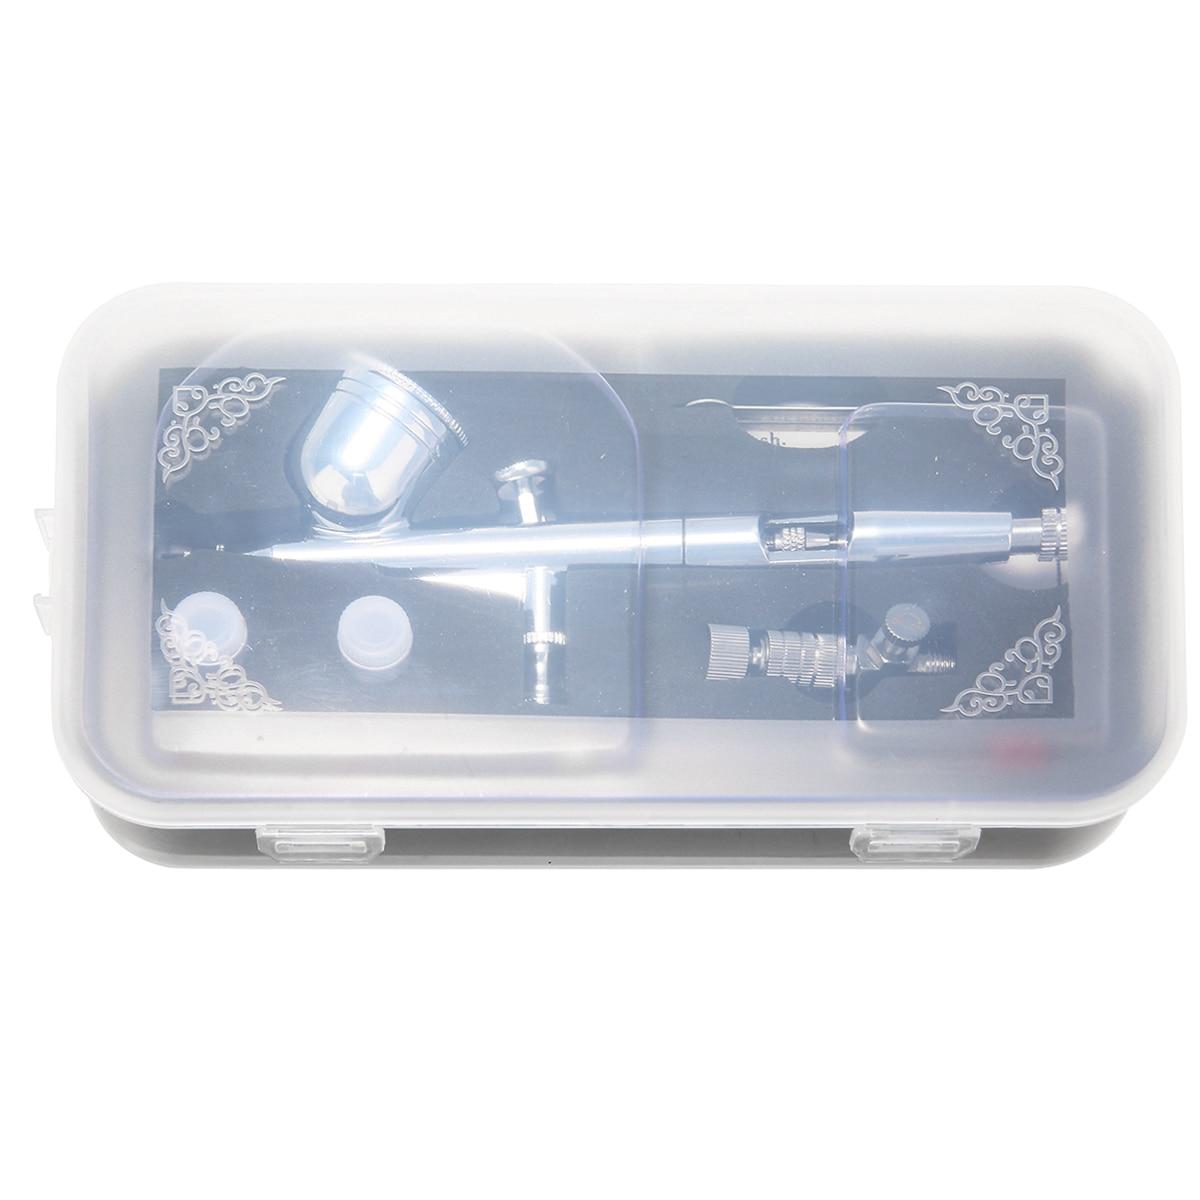 New 130T Dual Action Airbrush 0.2/0.5mm Gravity Feed Airbrush Spray Tool Paint Art Spray Gun DIY Power Tools